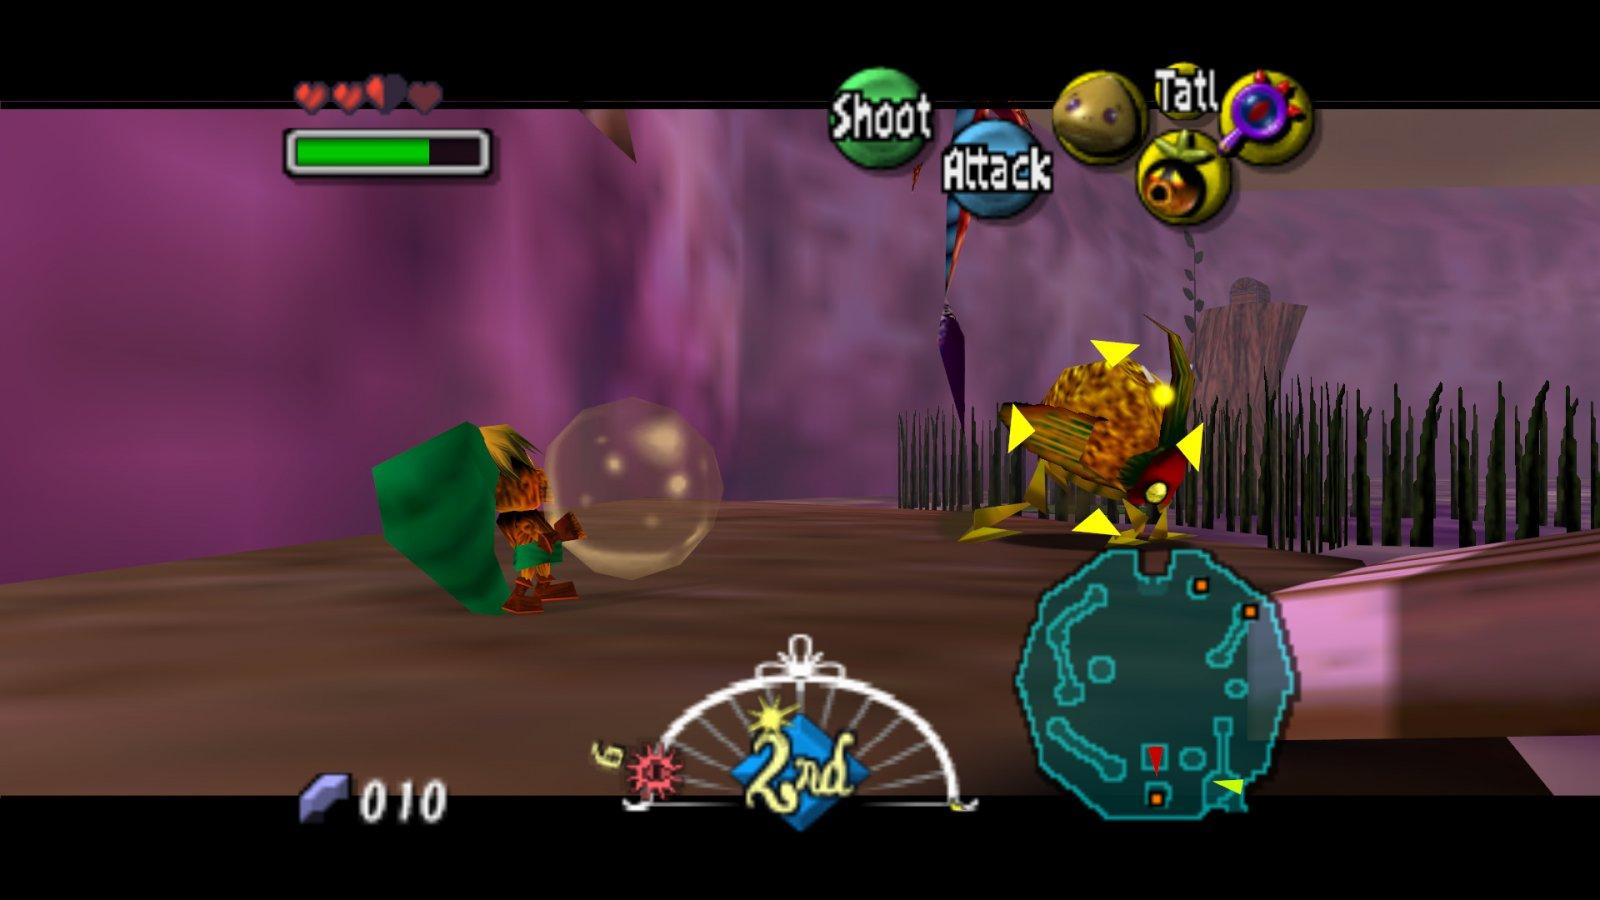 GP The Legend of Zelda_ Majora_s Mask-01.jpg